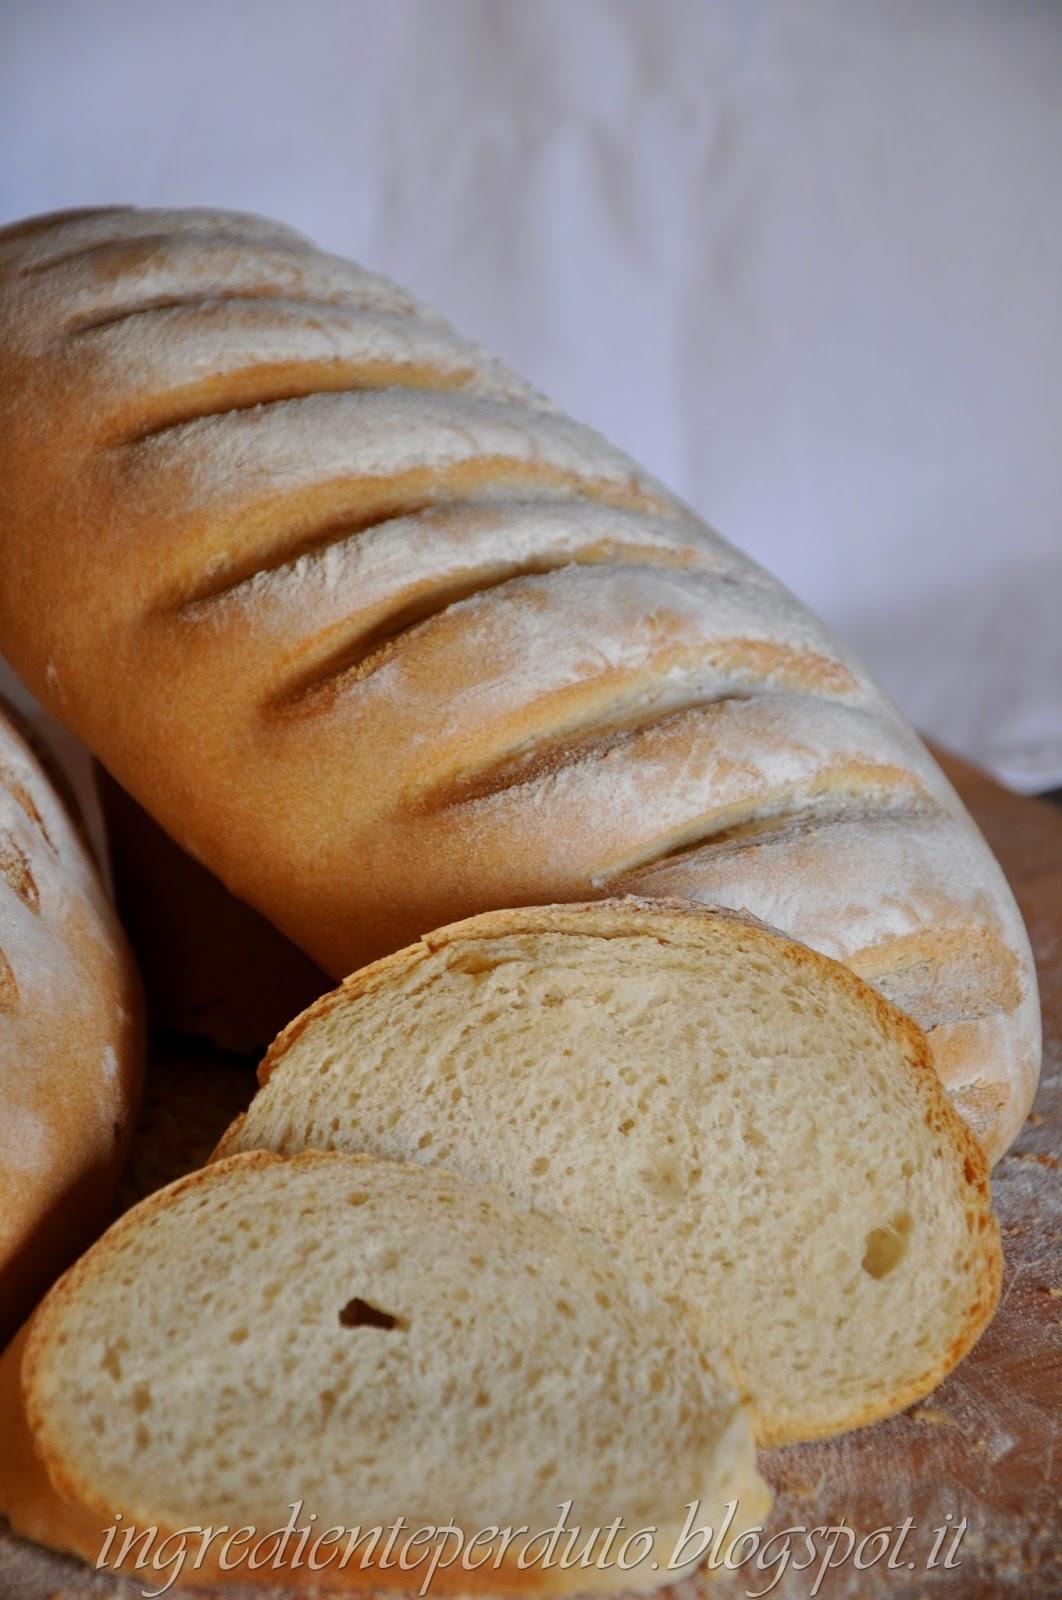 Pane al riso coupe de saucisson-ingrediente perduto